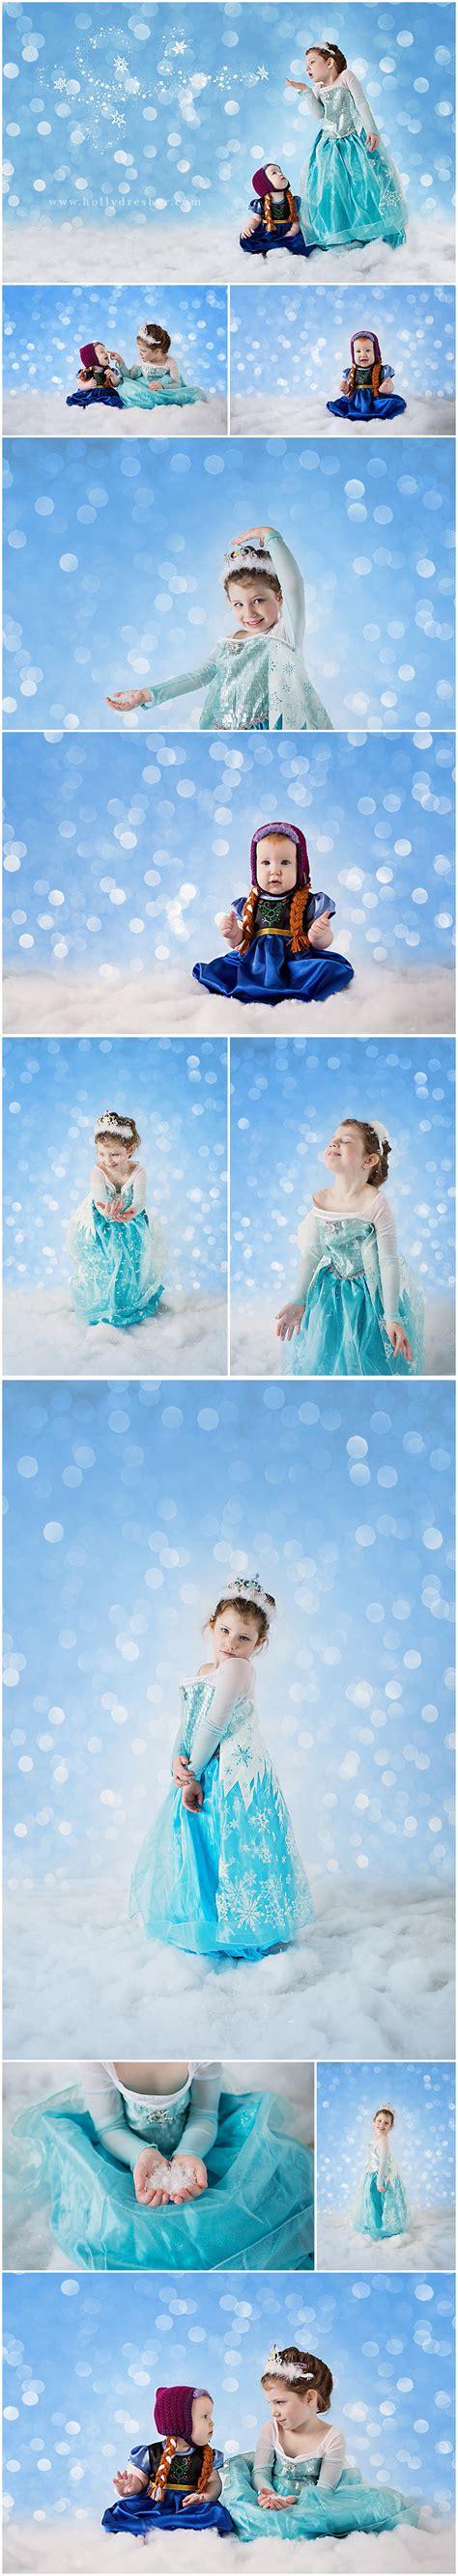 themed photoshoot frozen themed photoshoot portland or vancouver wa